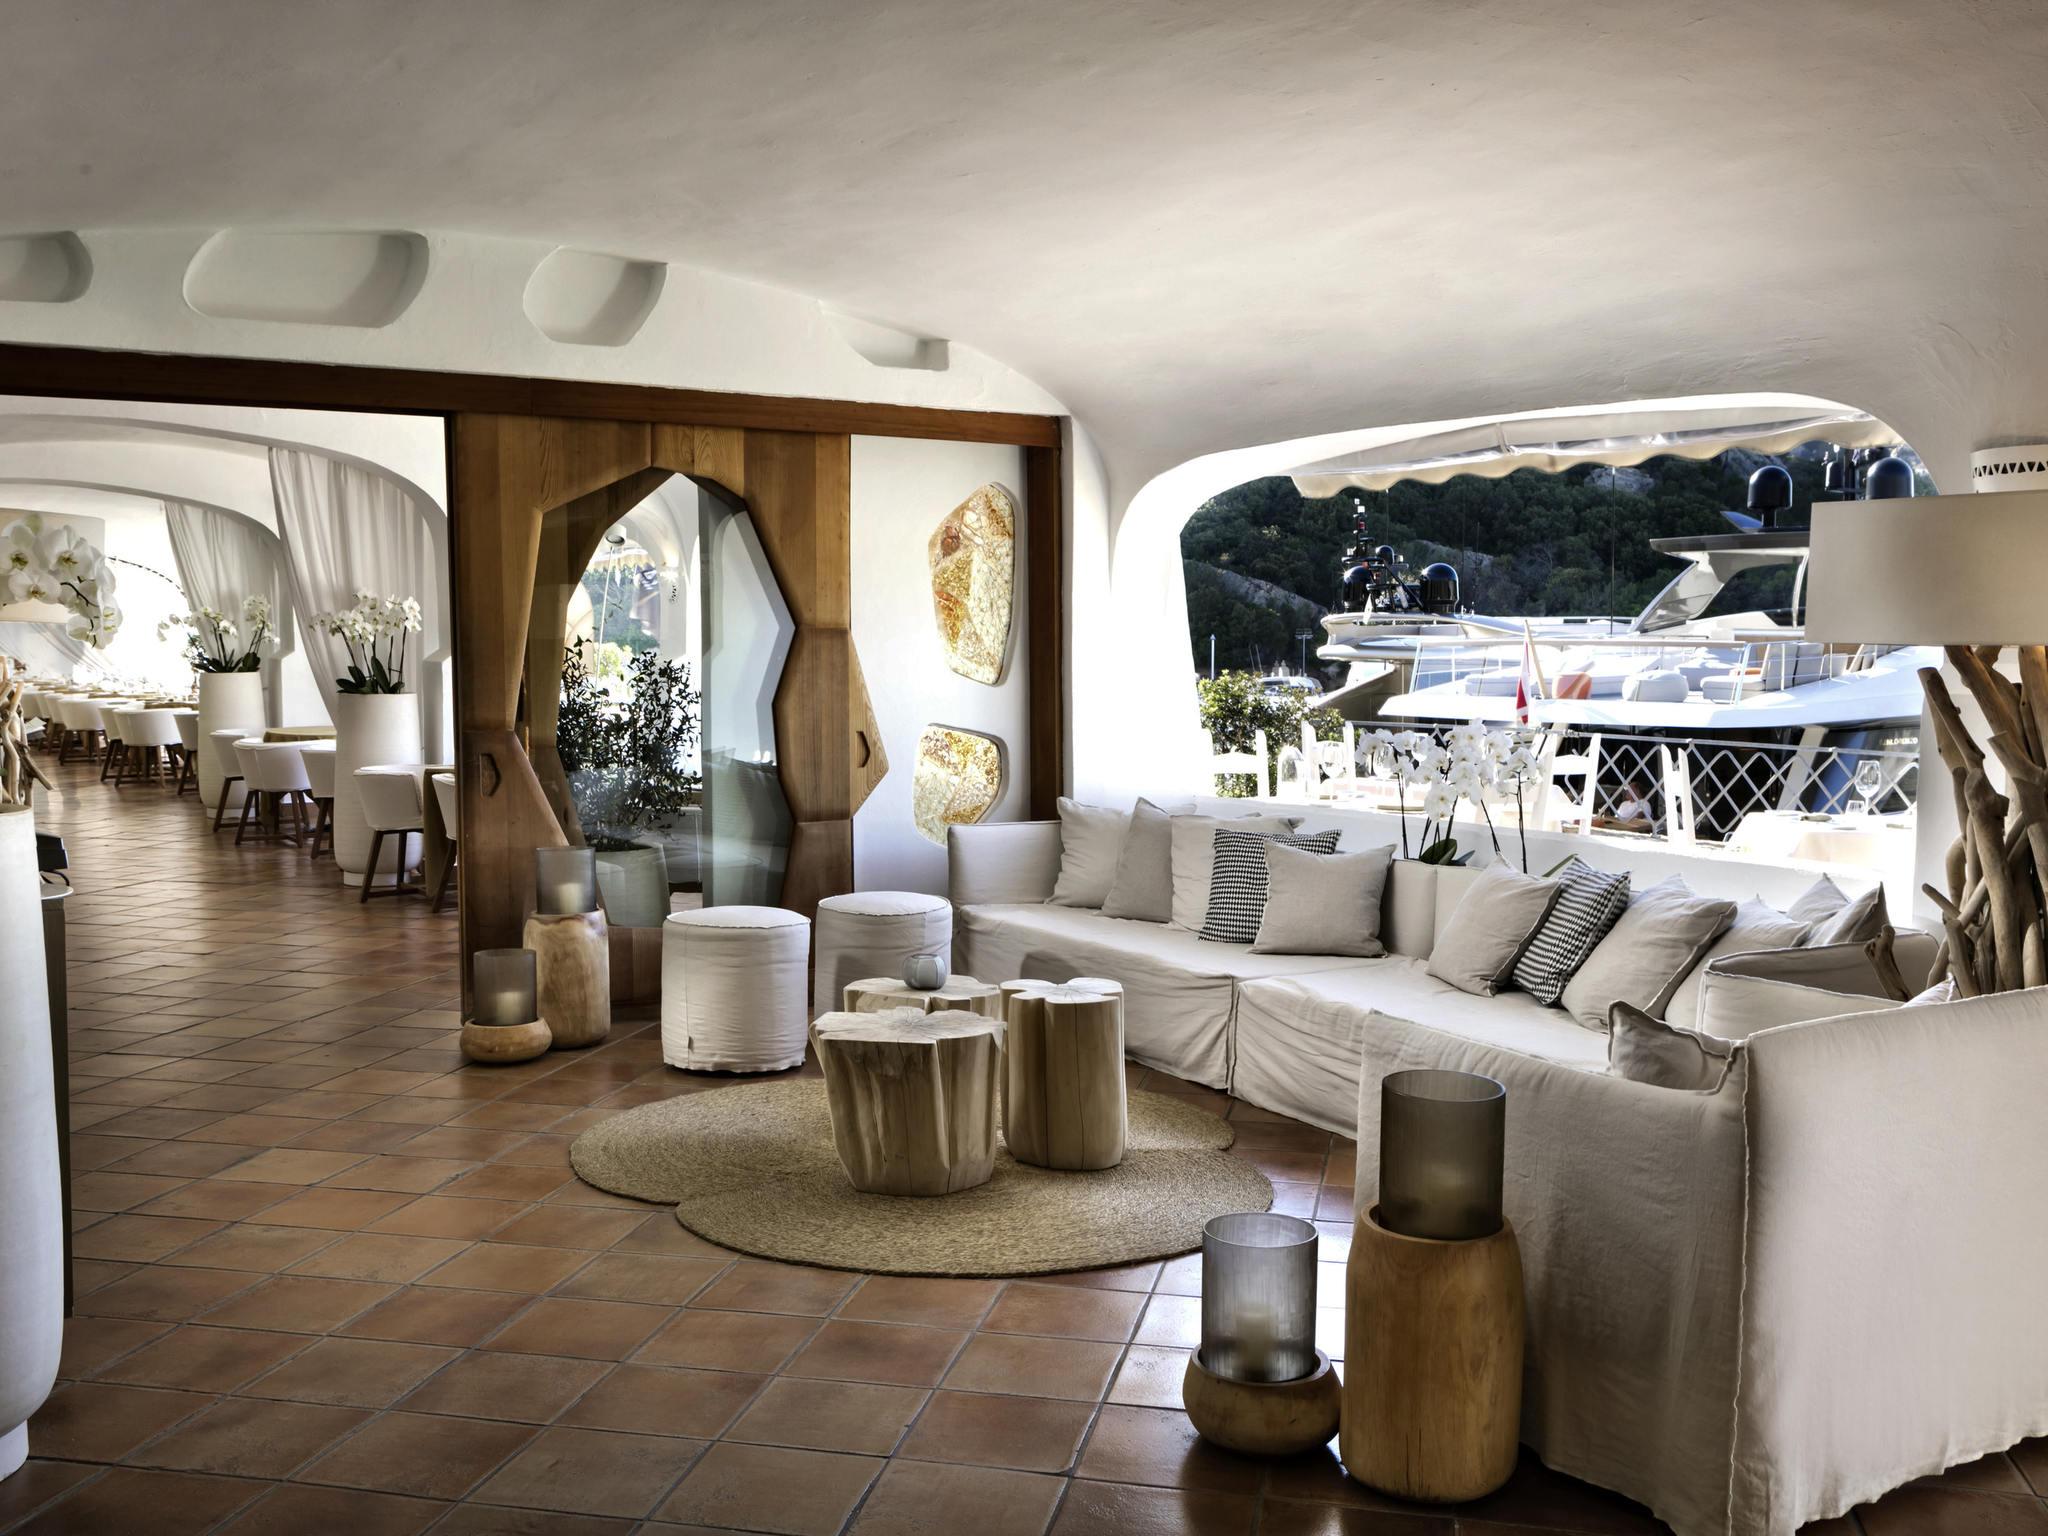 ... Restaurant - Grand Hotel Poltu Quatu Sardinia - MGallery by Sofitel ...